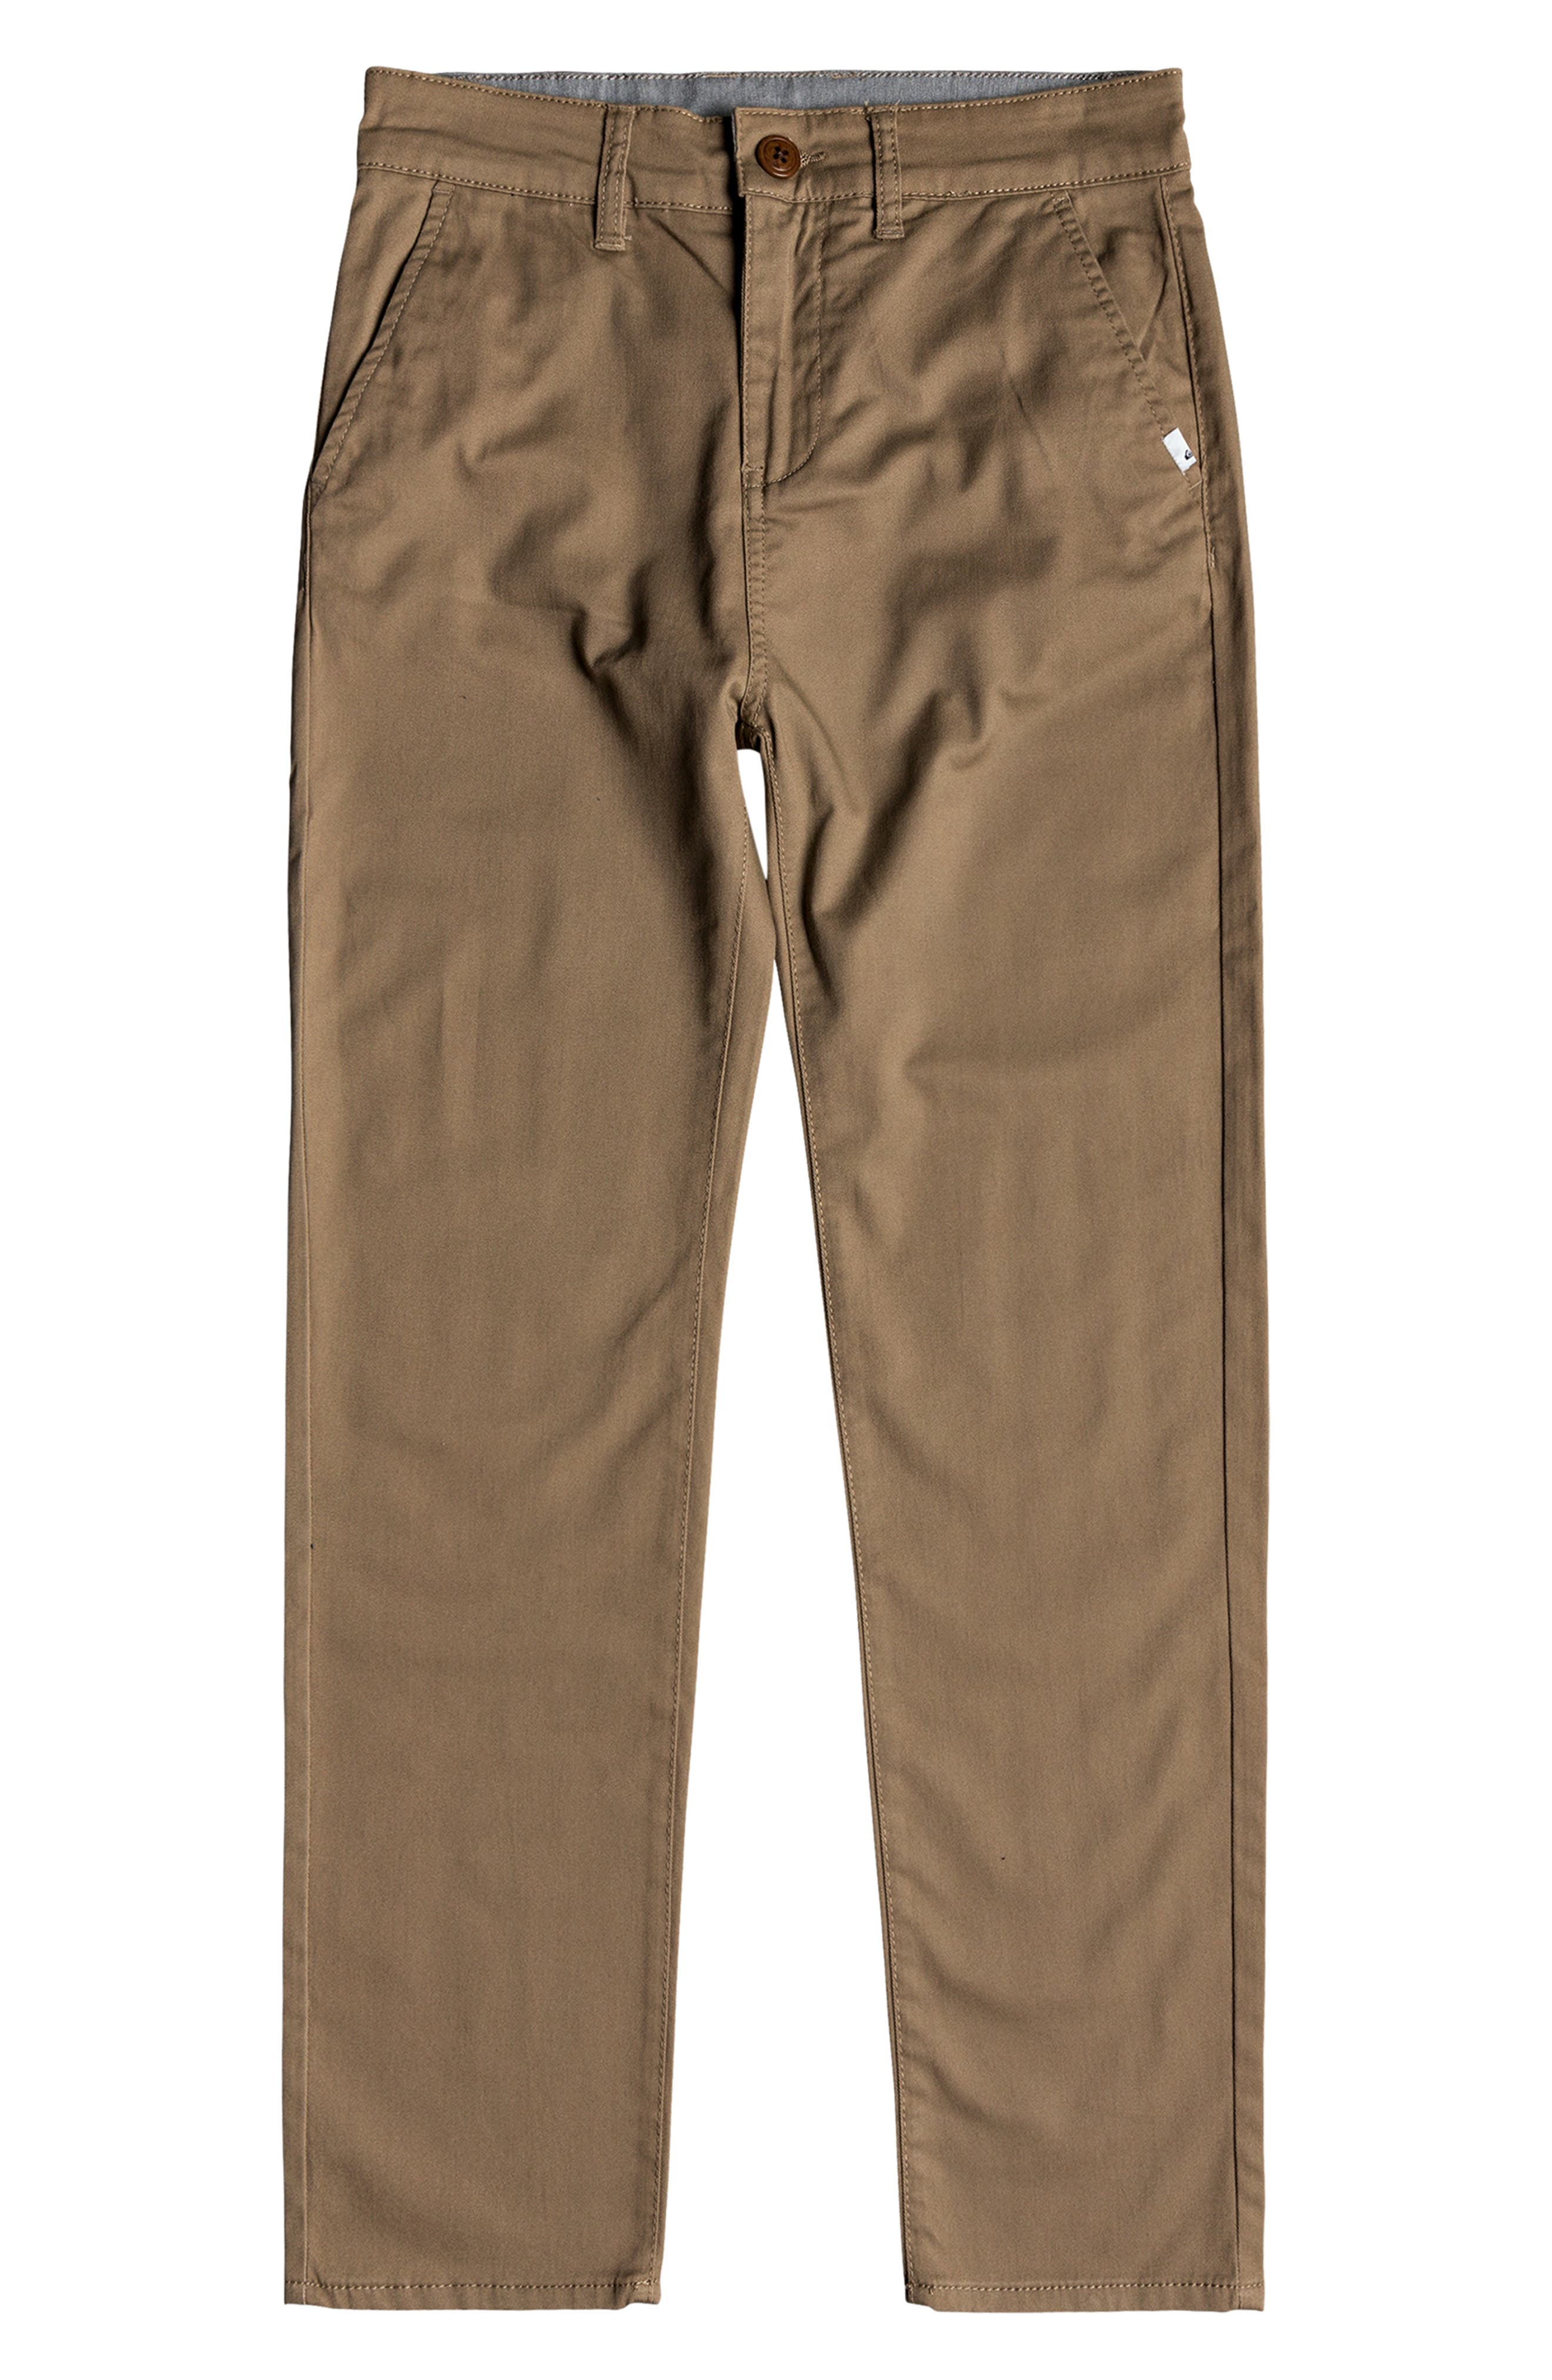 Boys Quiksilver Everyday Union Straight Leg Pants Size 26  Brown